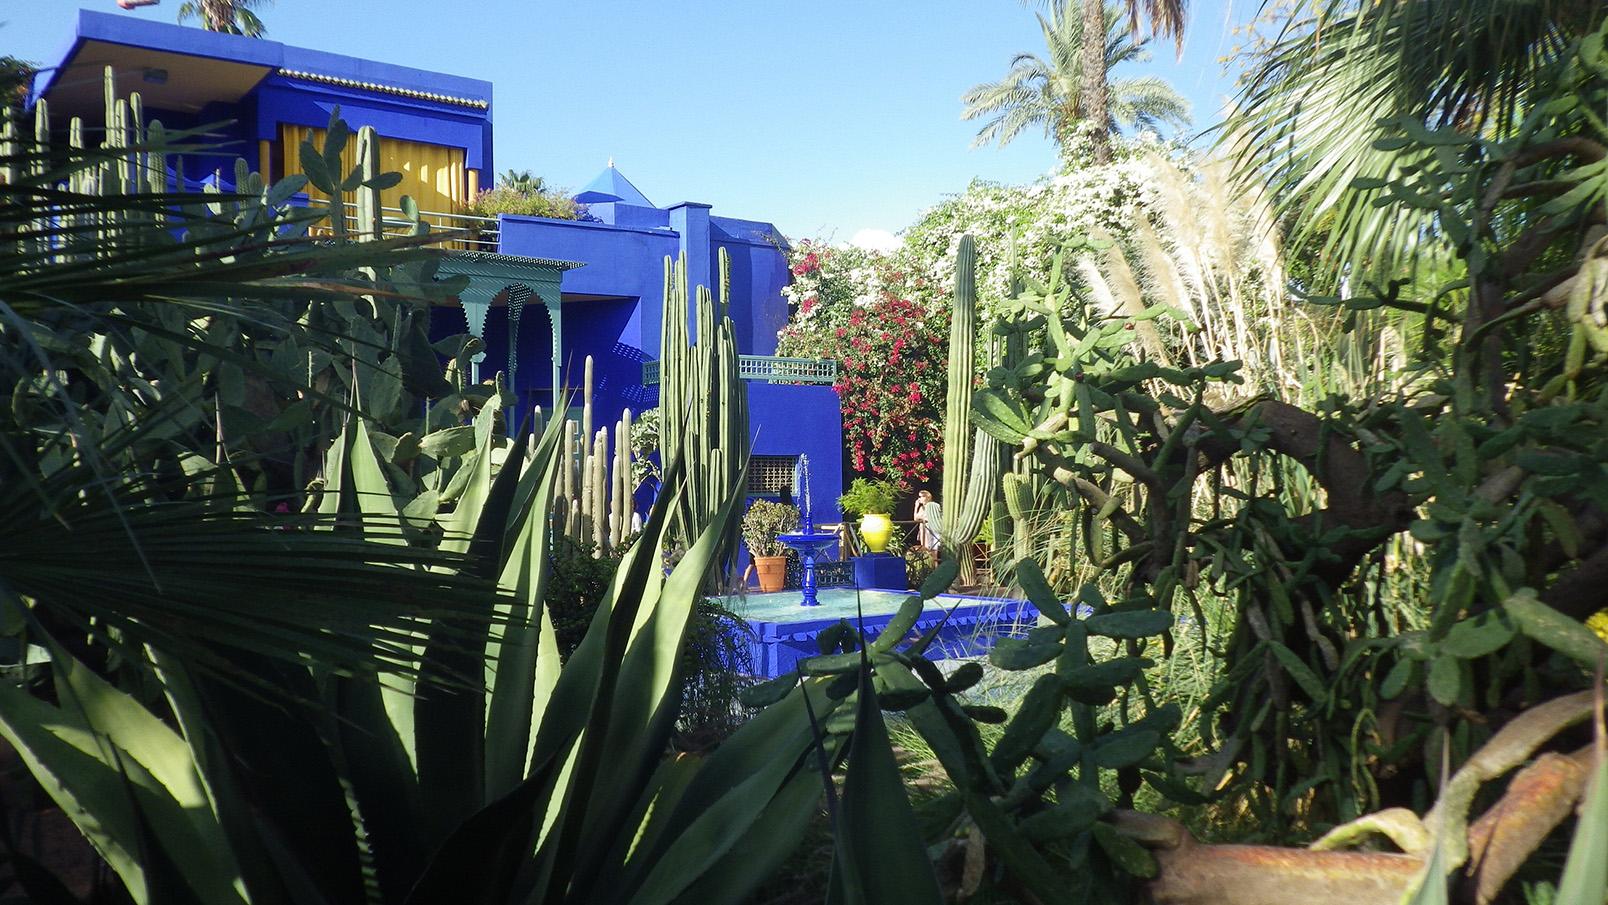 Maroc - Marrakech, jardin Majorelle (Gauthier Thonin)